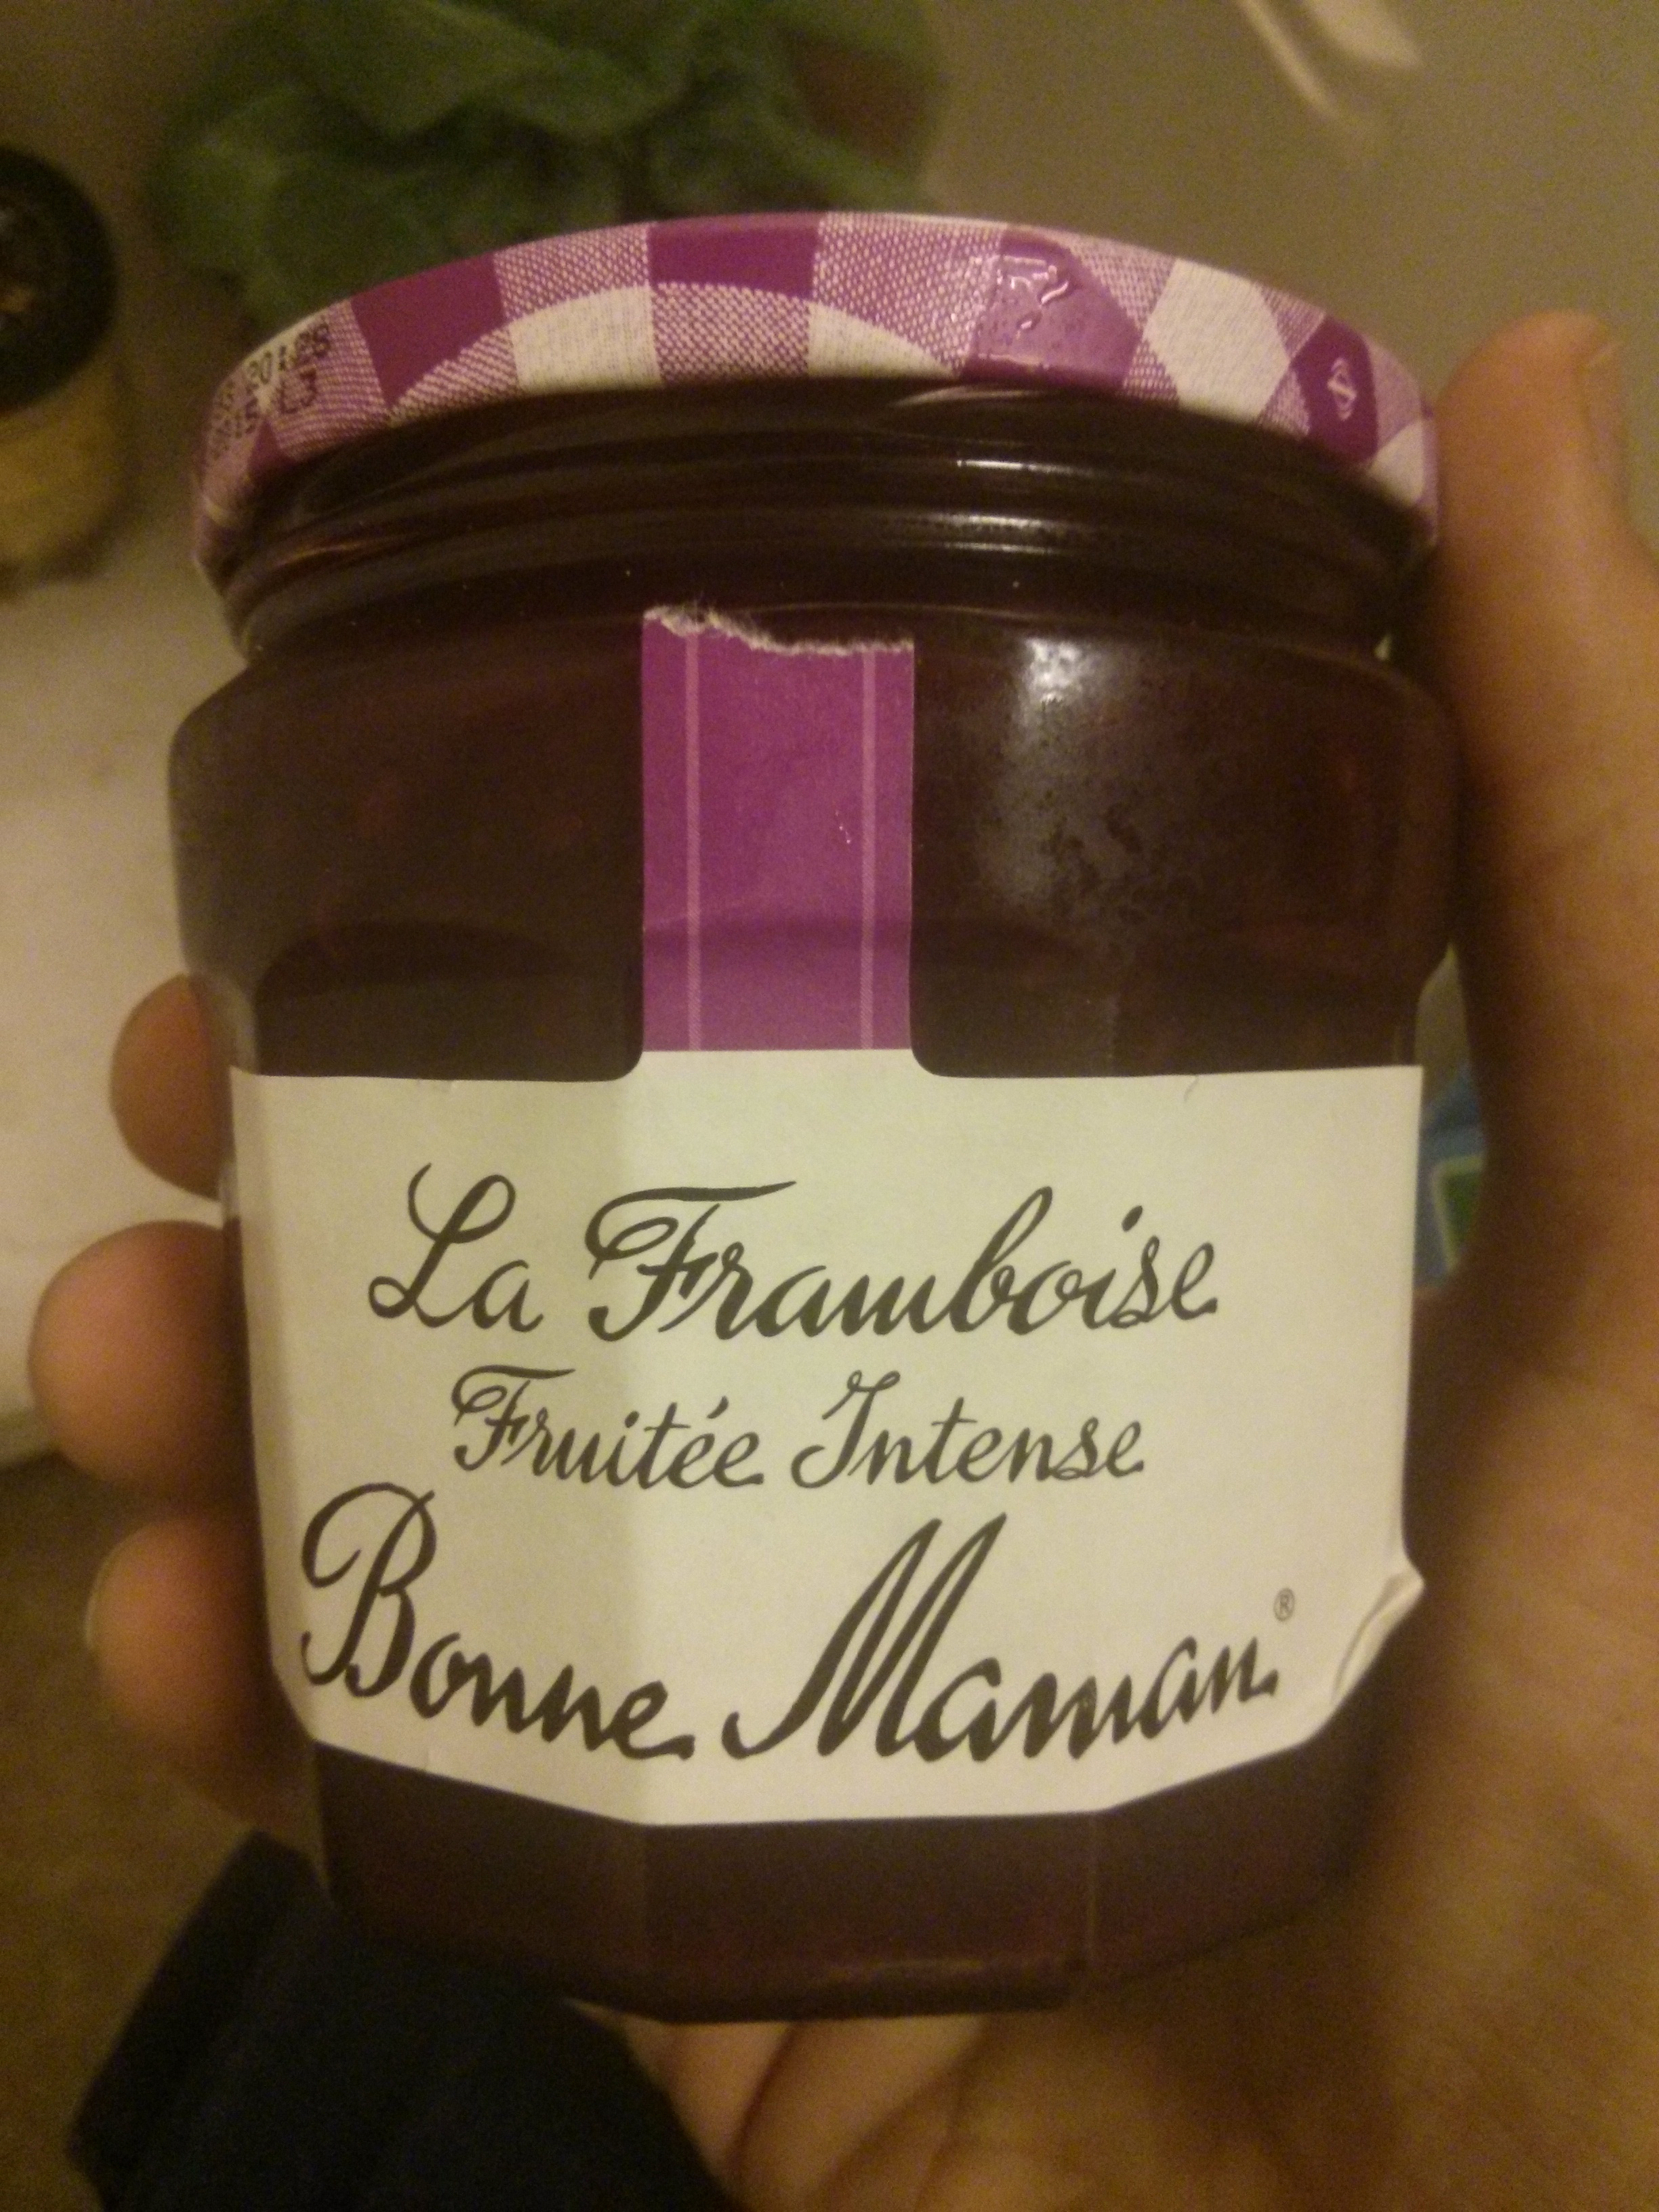 La Framboise Fruitée Intense - Prodotto - fr